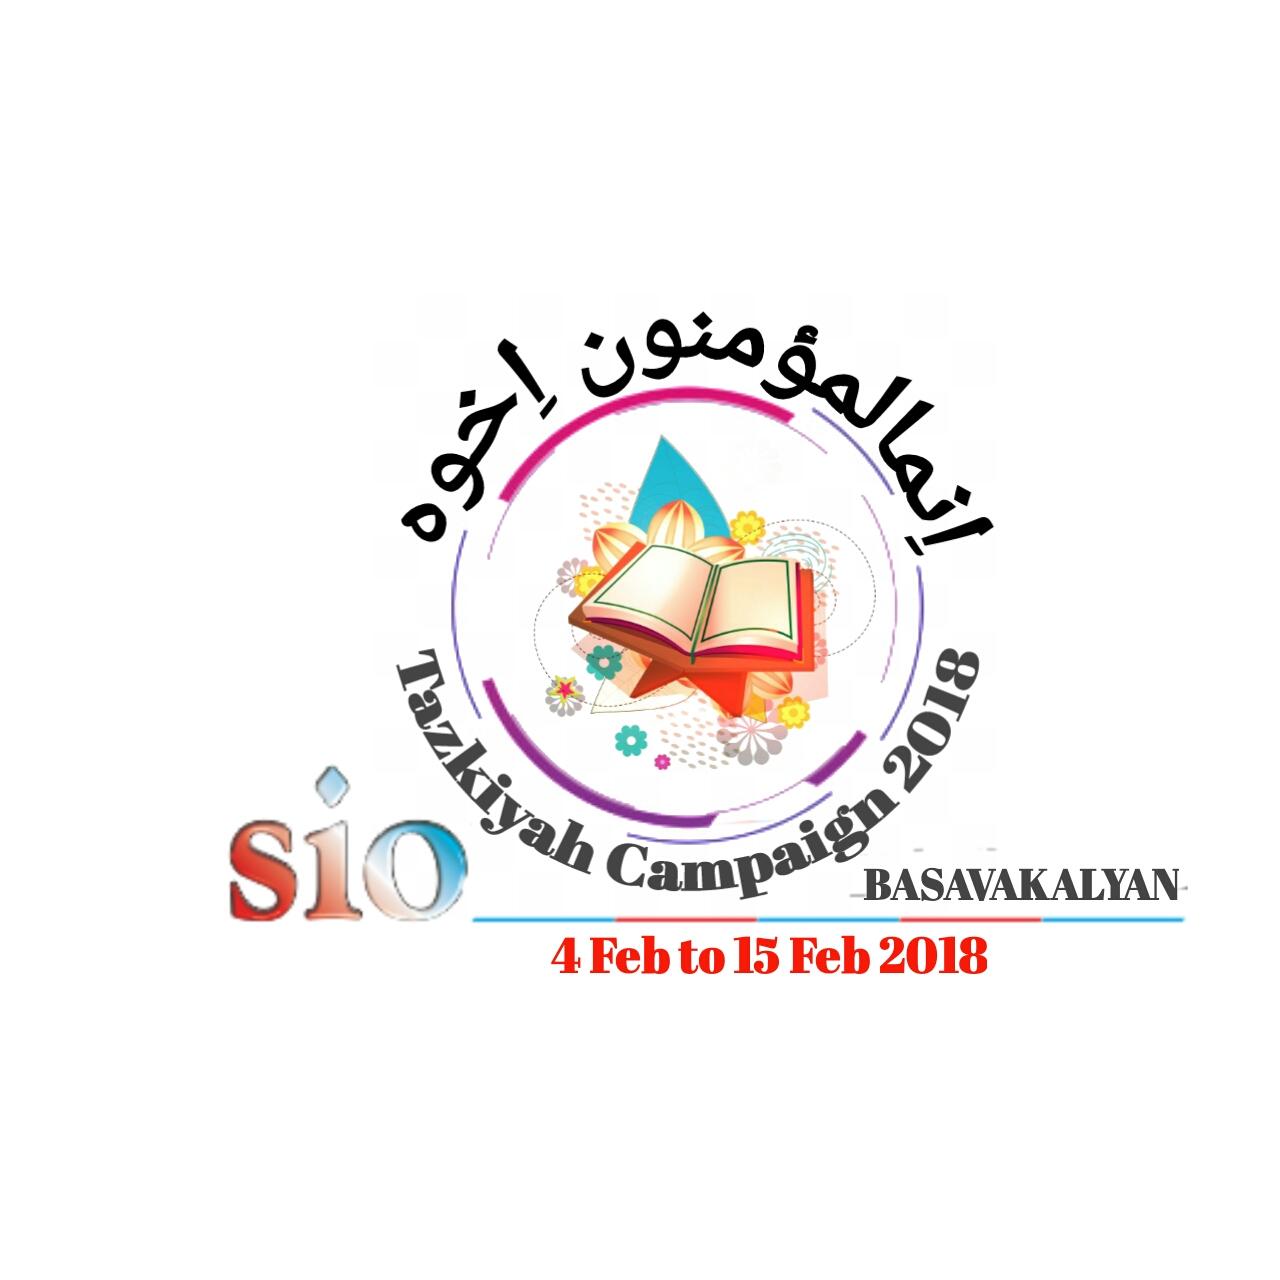 c2d1a7eeb30 SIO Basavakalyan Unit  Launching Program Tazkiya Campaign in ...